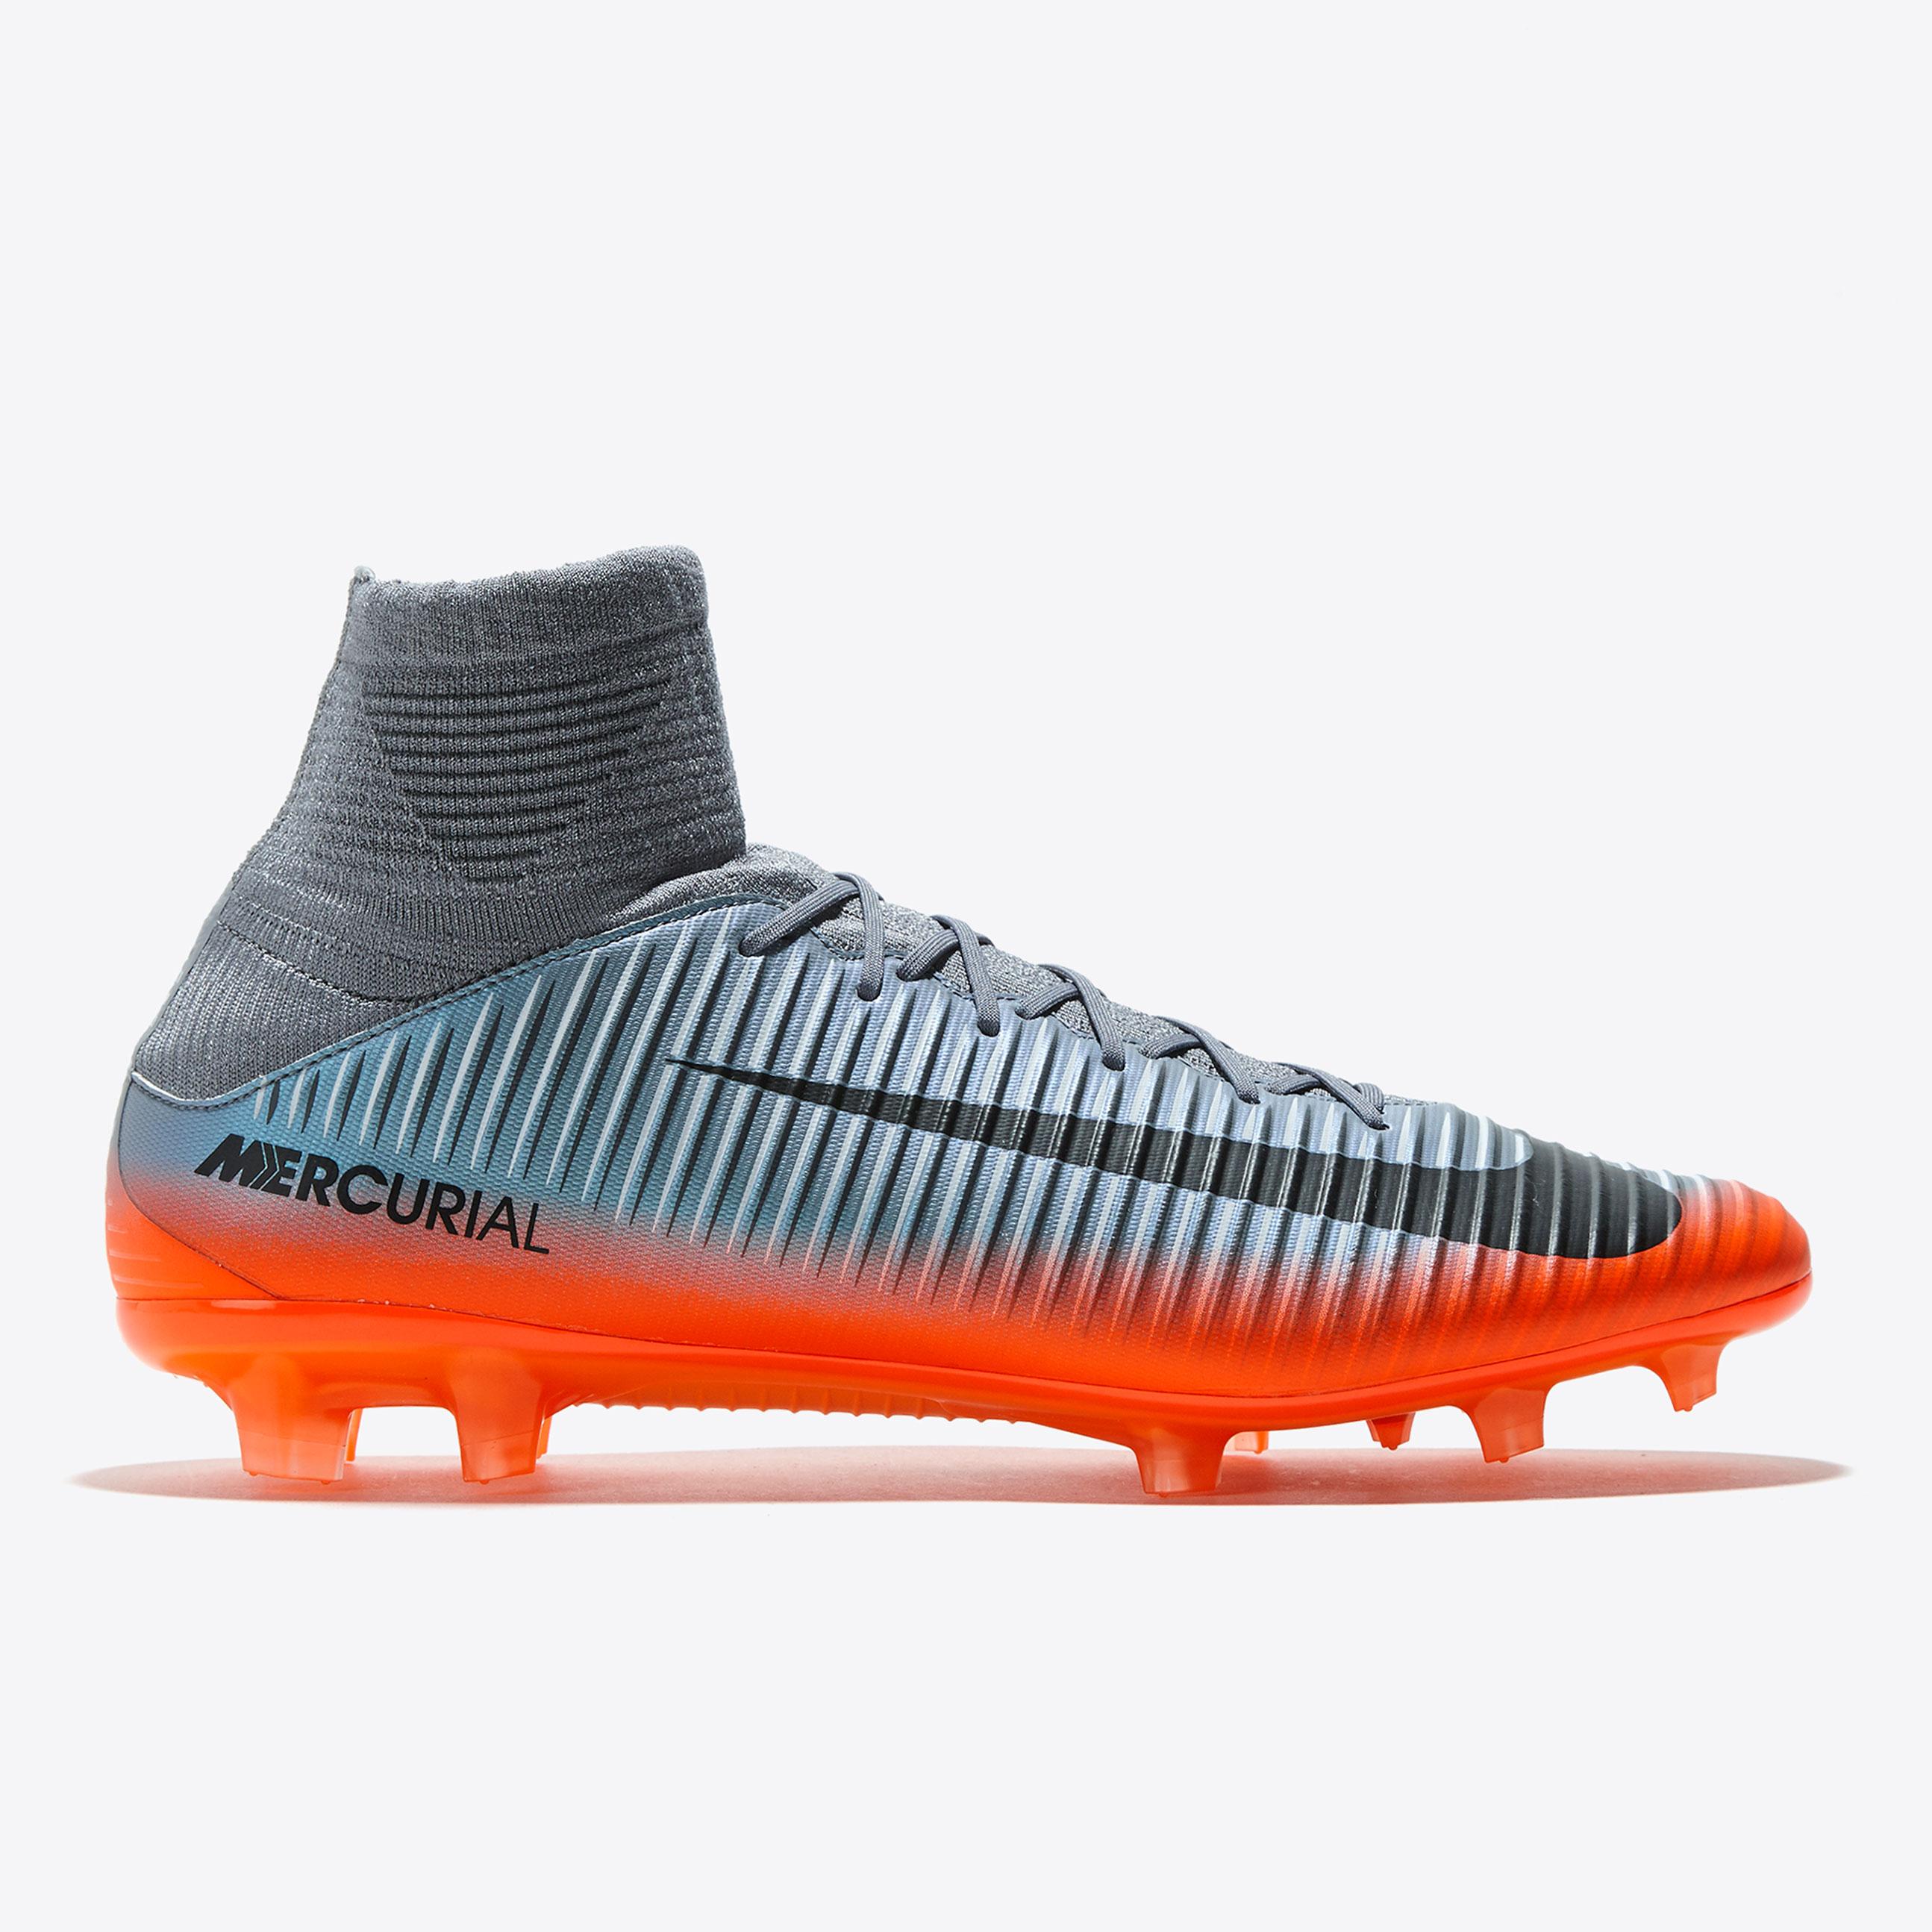 on sale 6f1cc 5e312 clearance nike mercurial vapor ix neptune blue a9e28 57454  order nike nike  mercurial football boots compare prices at footy. 0f22b 44a66